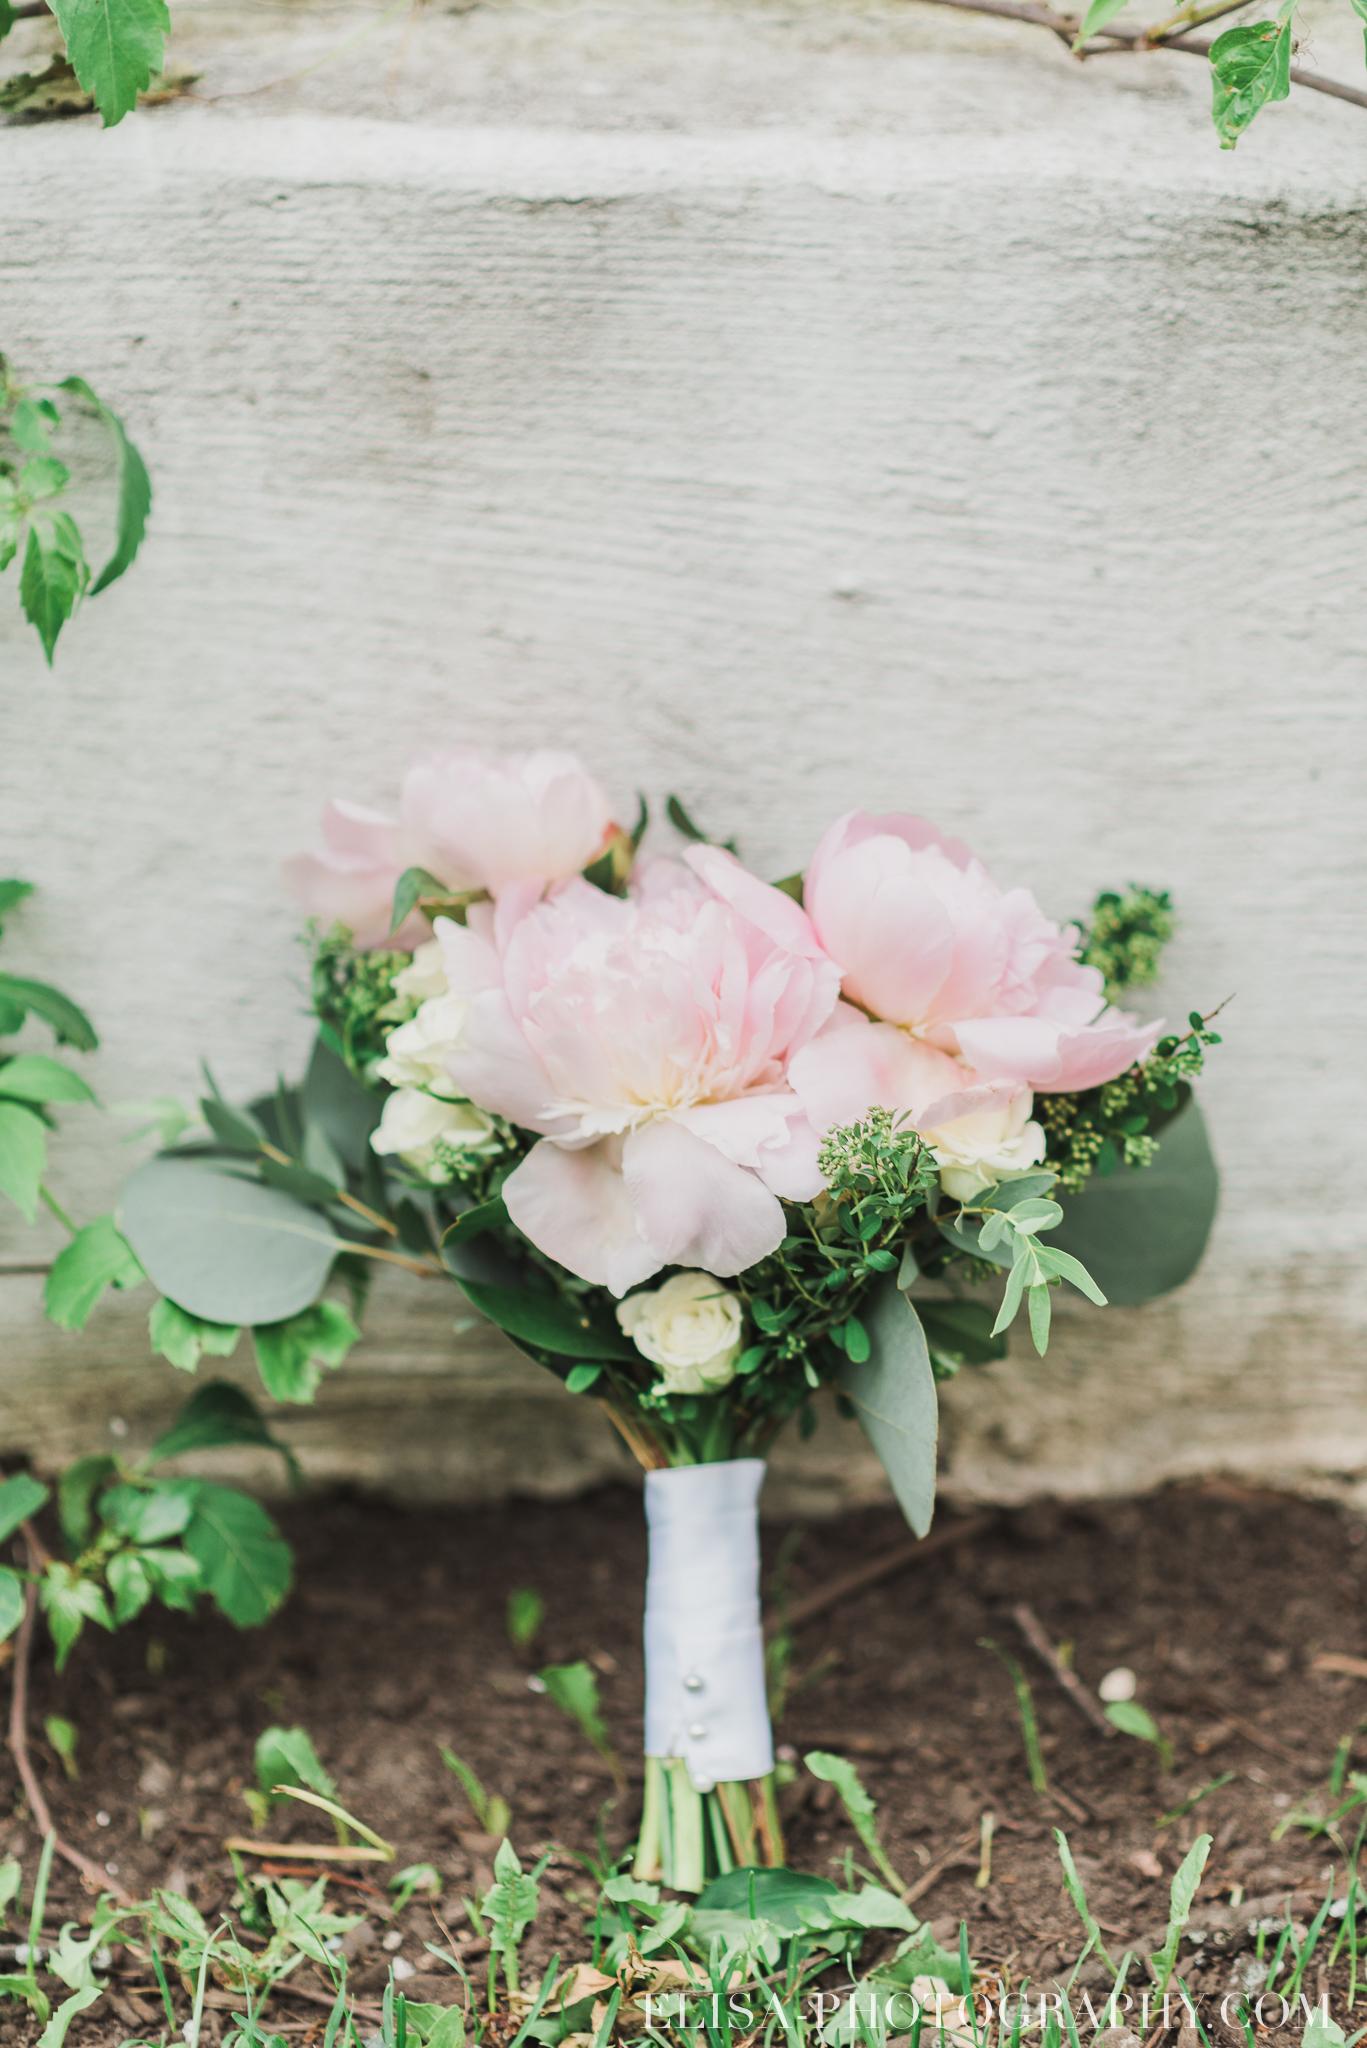 photo mariage domaine cataraqui wedding portrait couple inspiration anglaise jardin ville de quebec 2579 - Mariage d'inspiration anglaise au domaine Cataraqui